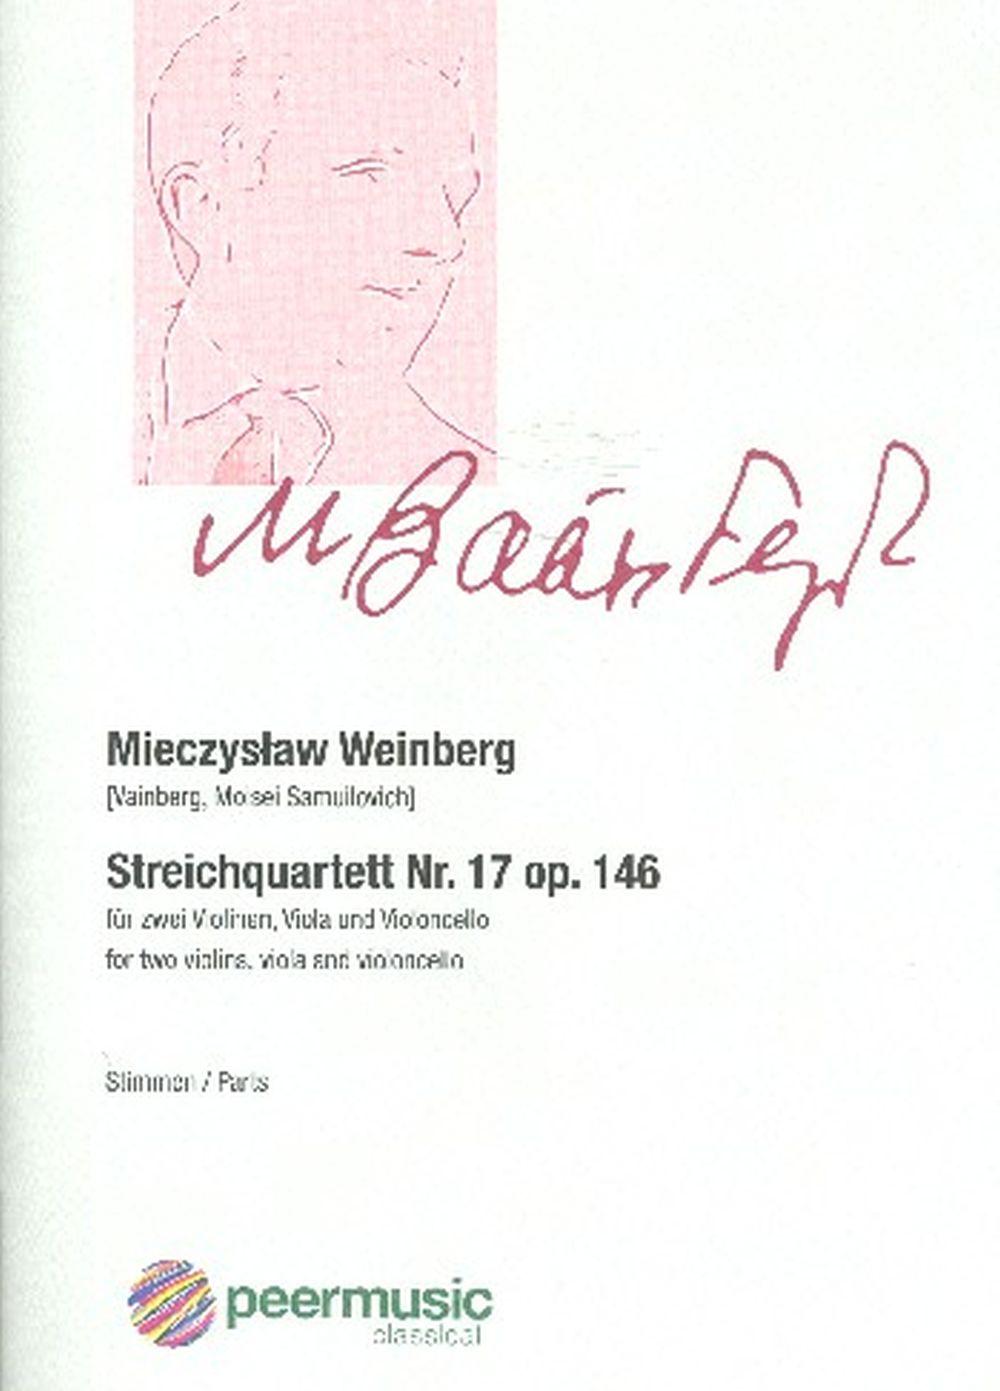 Mieczyslaw Weinberg: Streichquartett Nr 17 Opus 146: String Ensemble: Parts